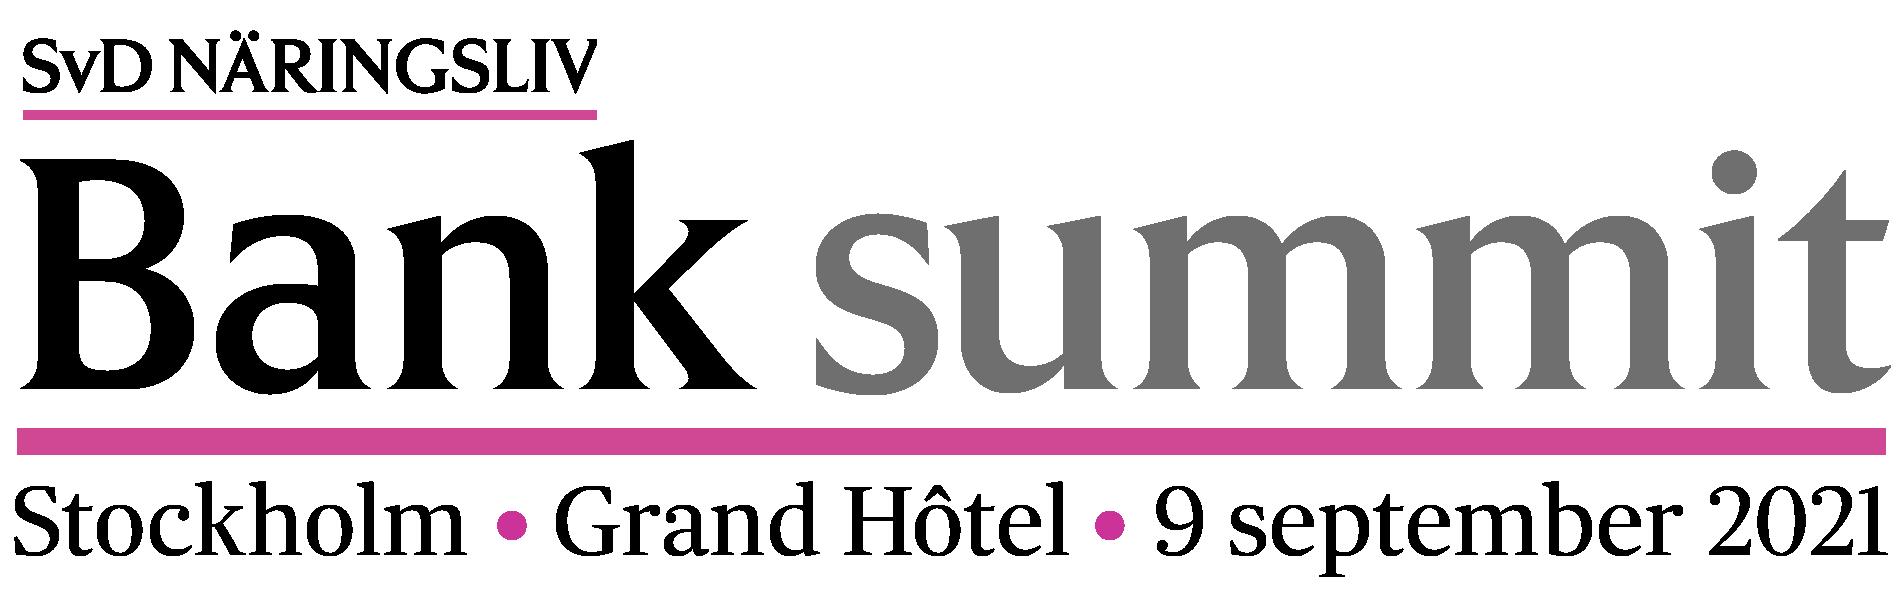 SVD Bank Summit